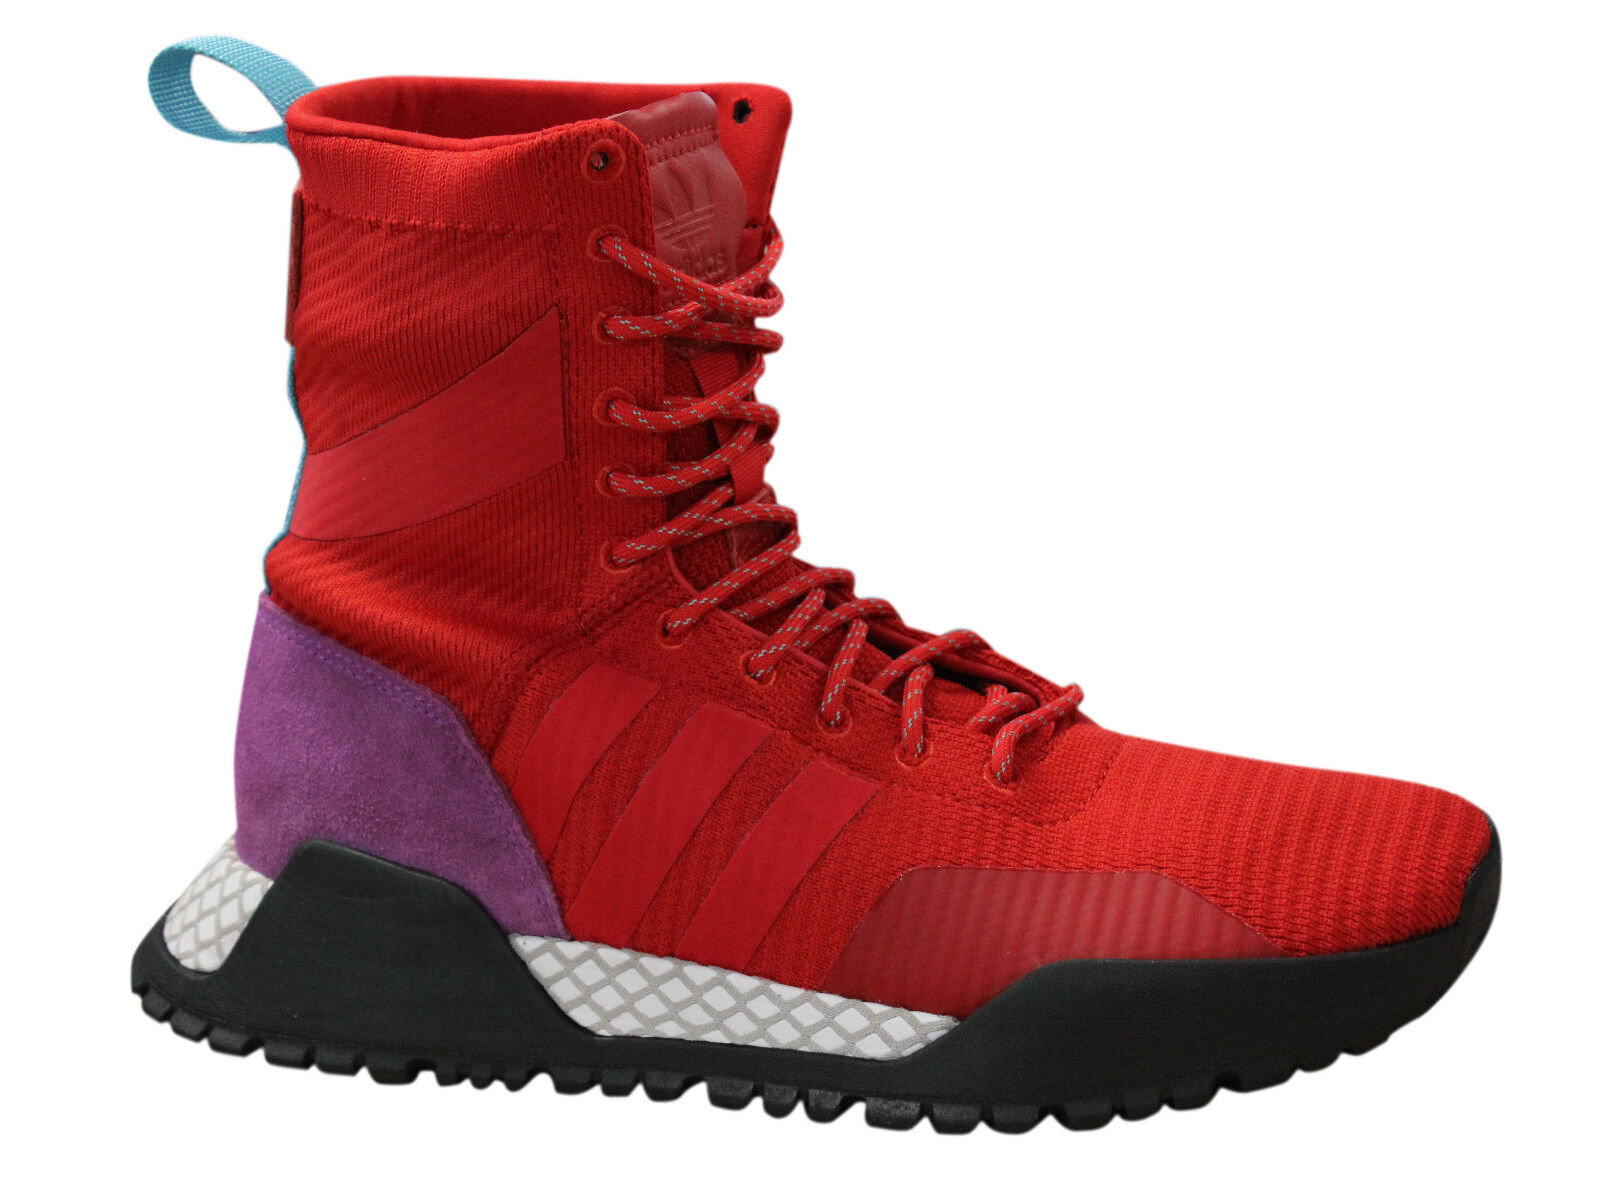 adidas Originals A.F 1.3 Primeknit Boot Schuhe Rot für